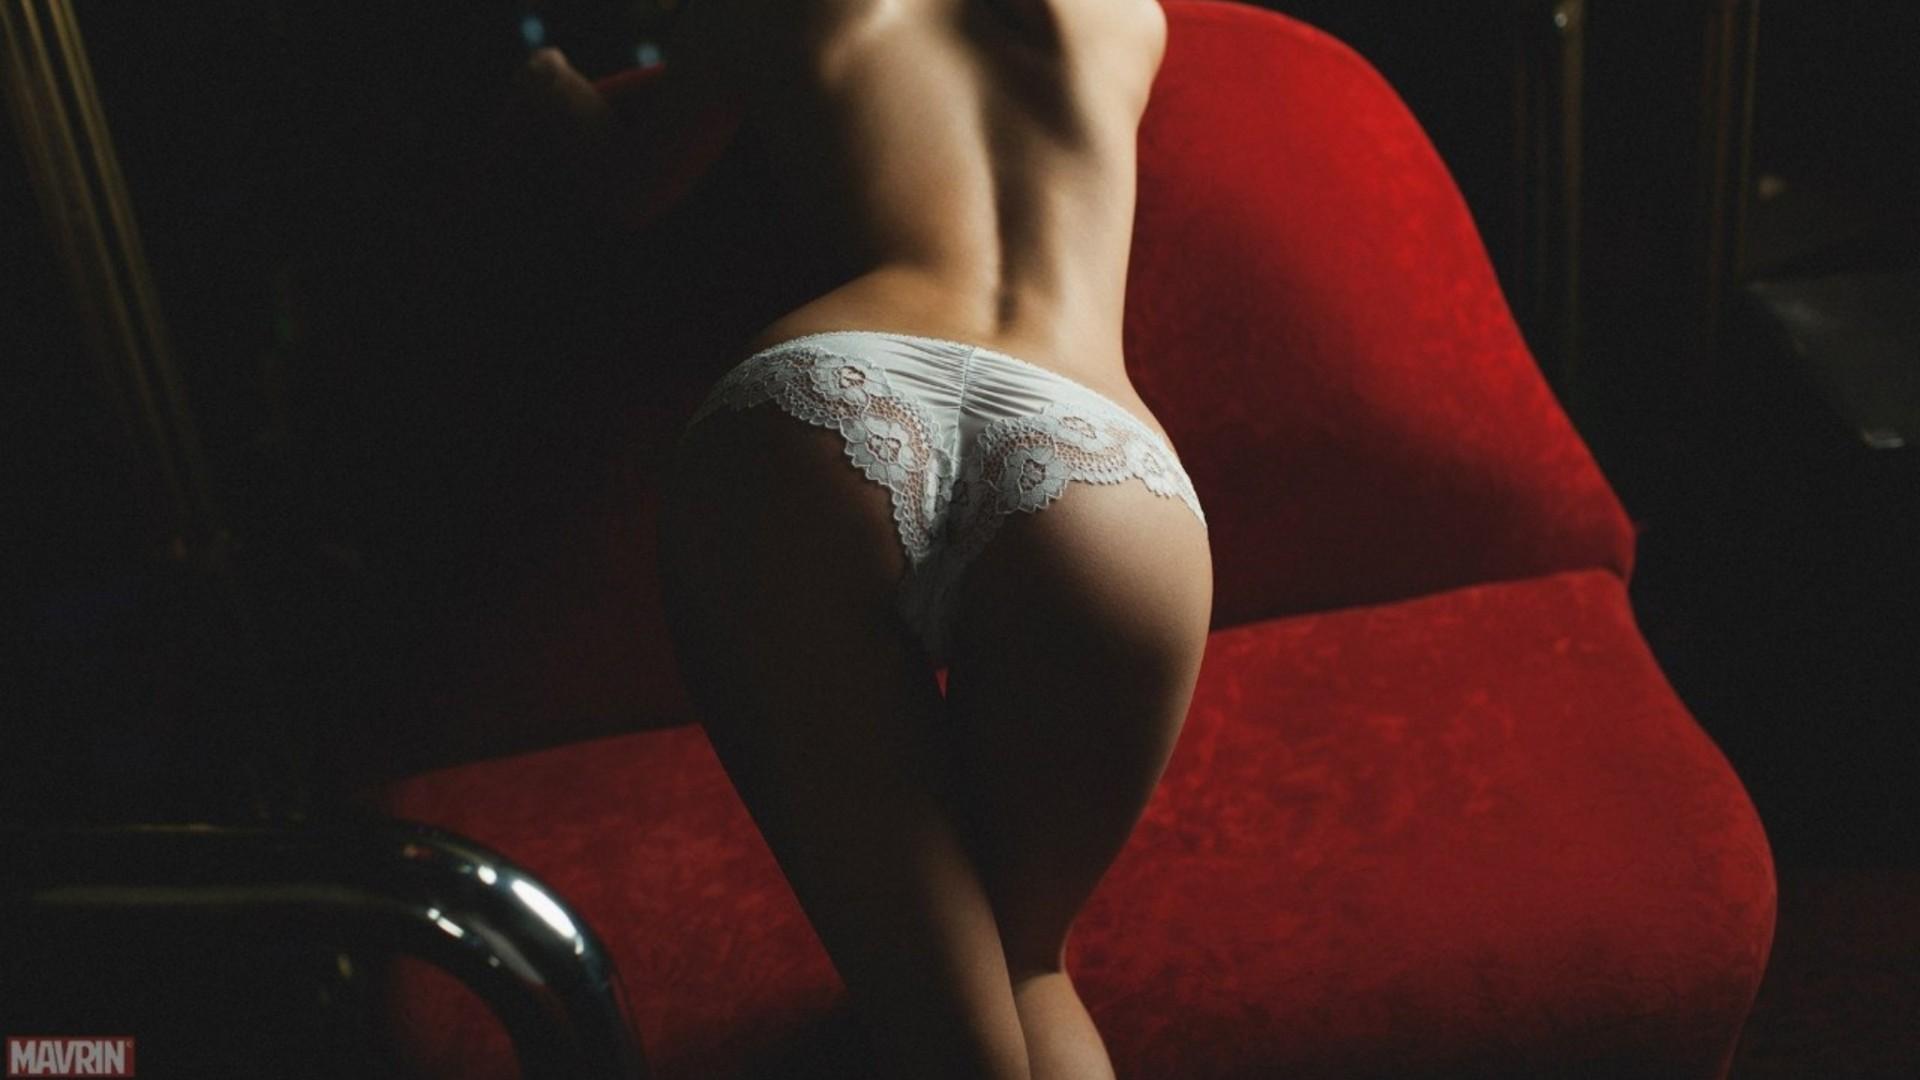 Трусикина попе порно фото